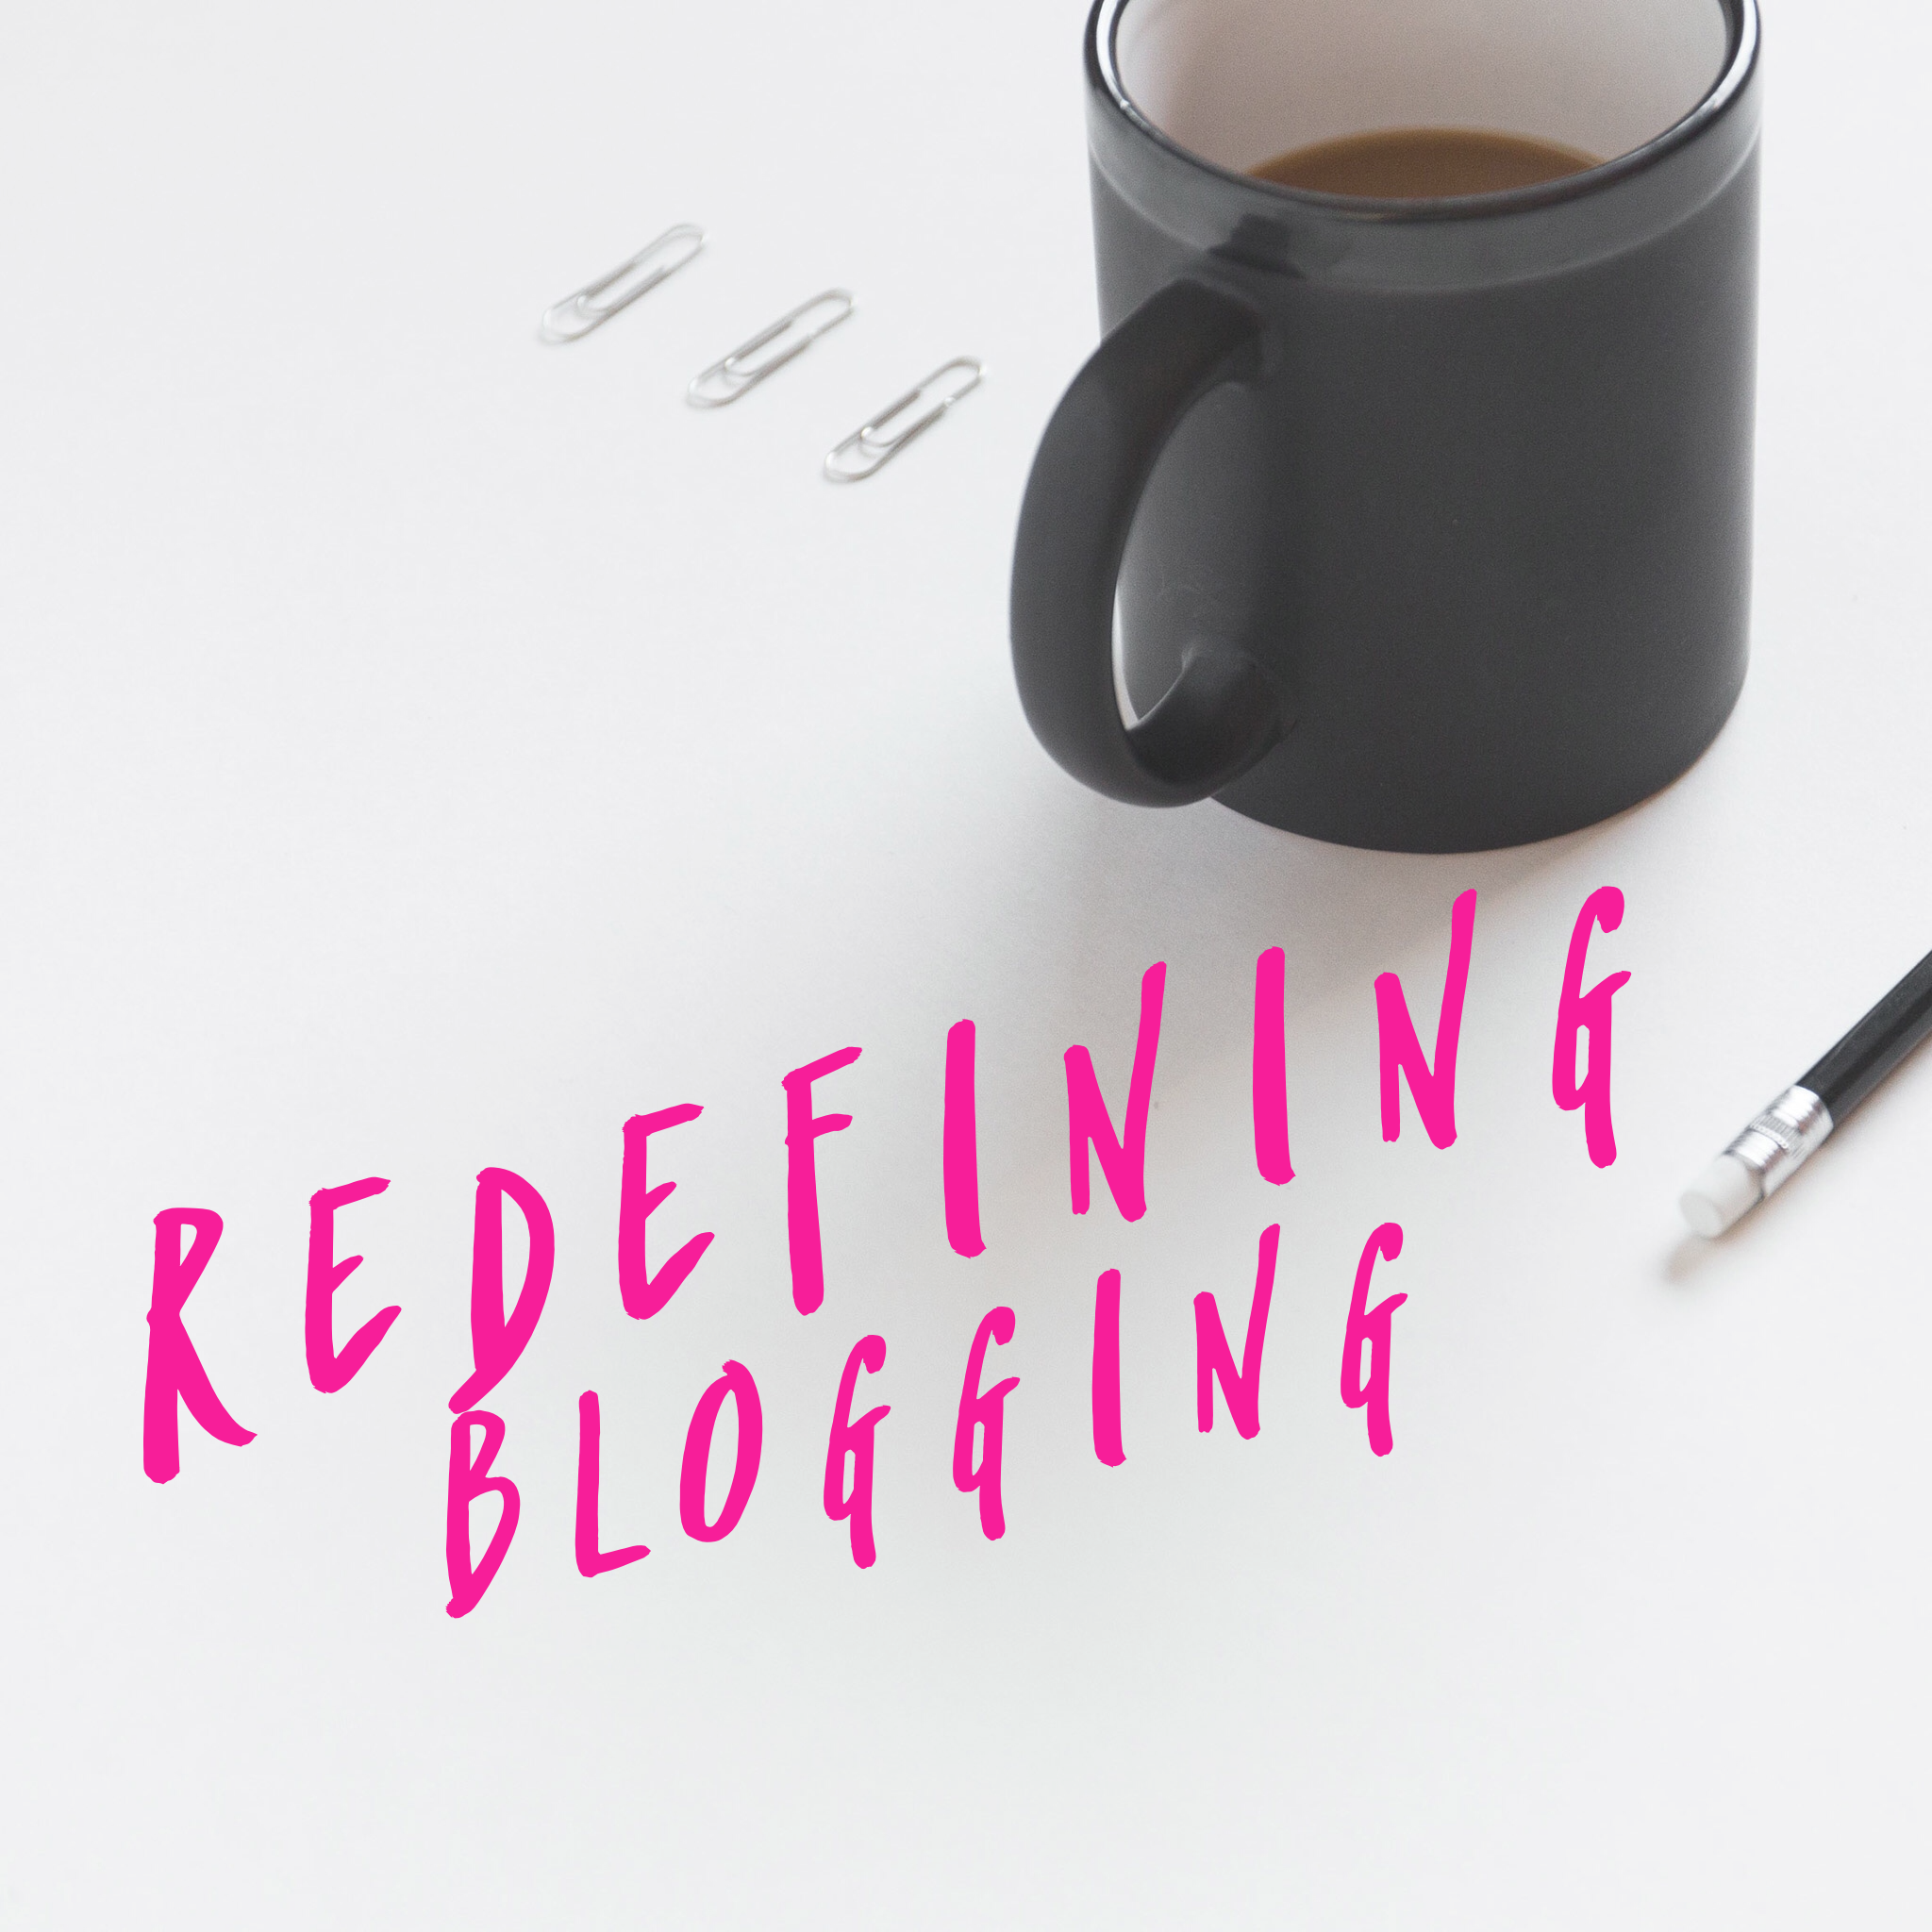 Redefining Blogging